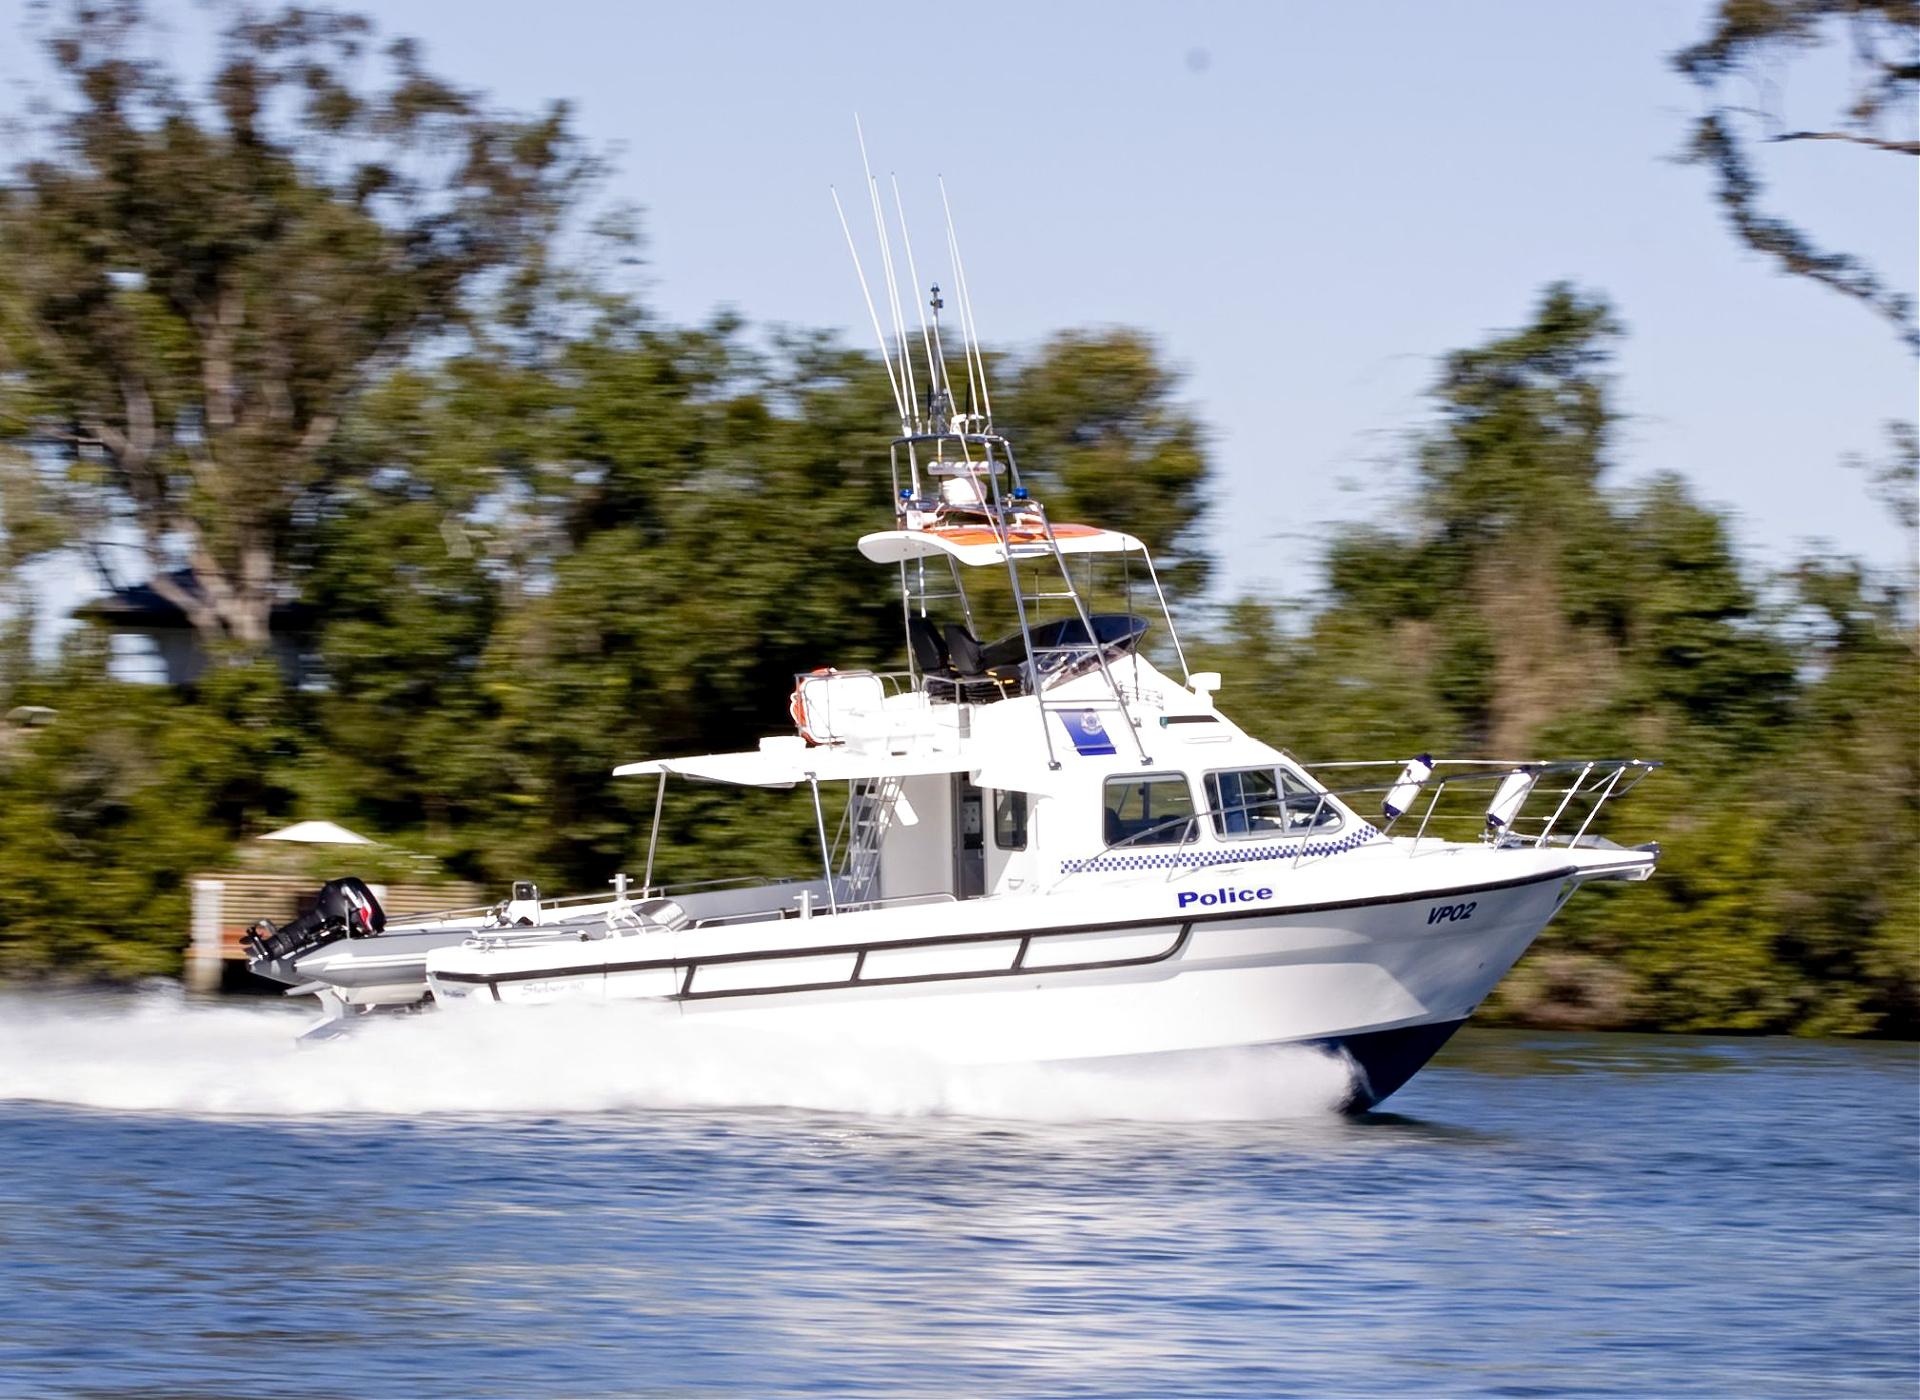 Steber 40ft Police Vessel - Victoria